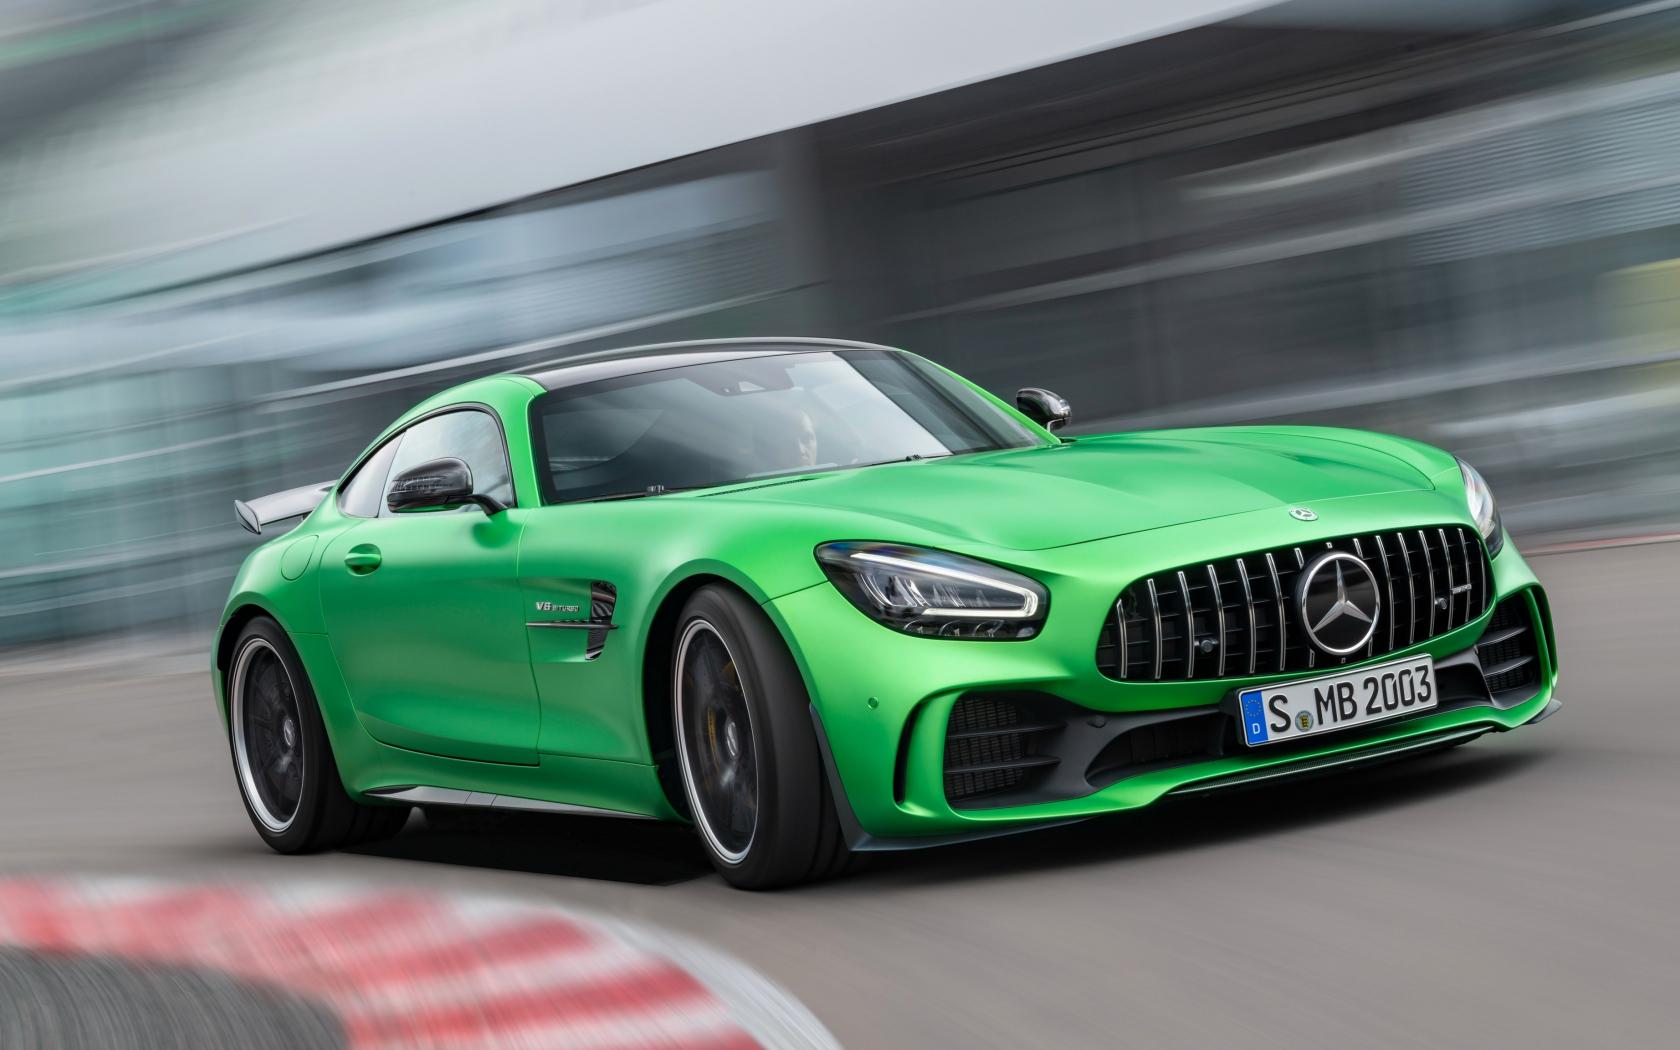 Mercedes-AMG GT, green car, on-road, 1680x1050 wallpaper